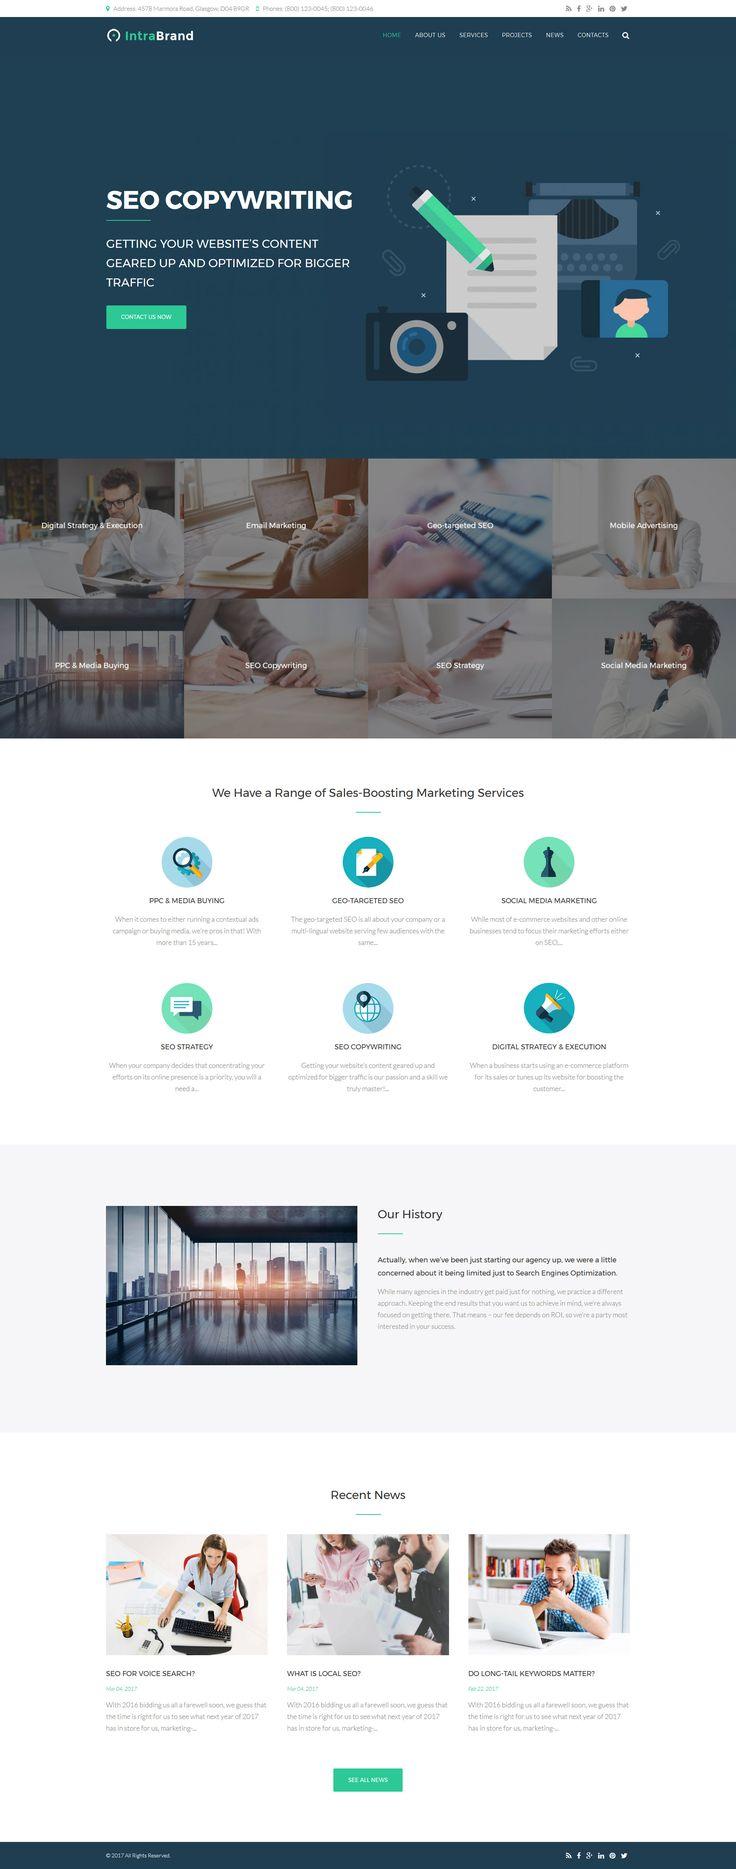 Intrabrand - SEO & Digital Marketing Agency Premium Drupal Template #63372 - https://www.templatemonster.com/drupal-themes/intrabrand-seo-digital-marketing-agency-premium-drupal-template-63372.html